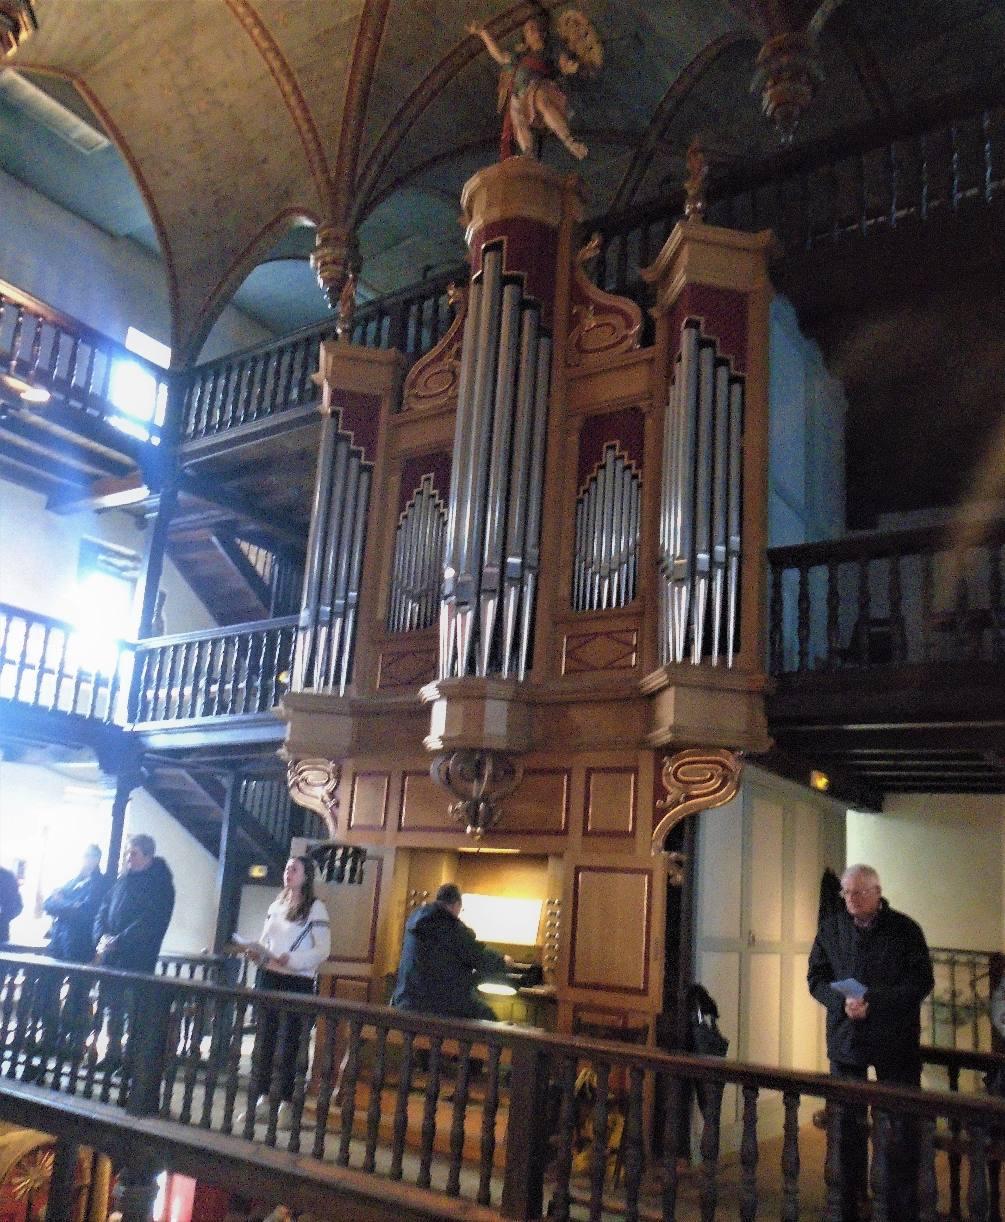 Domitille chante Ave Maria accompagnée par Philippe Guillmard